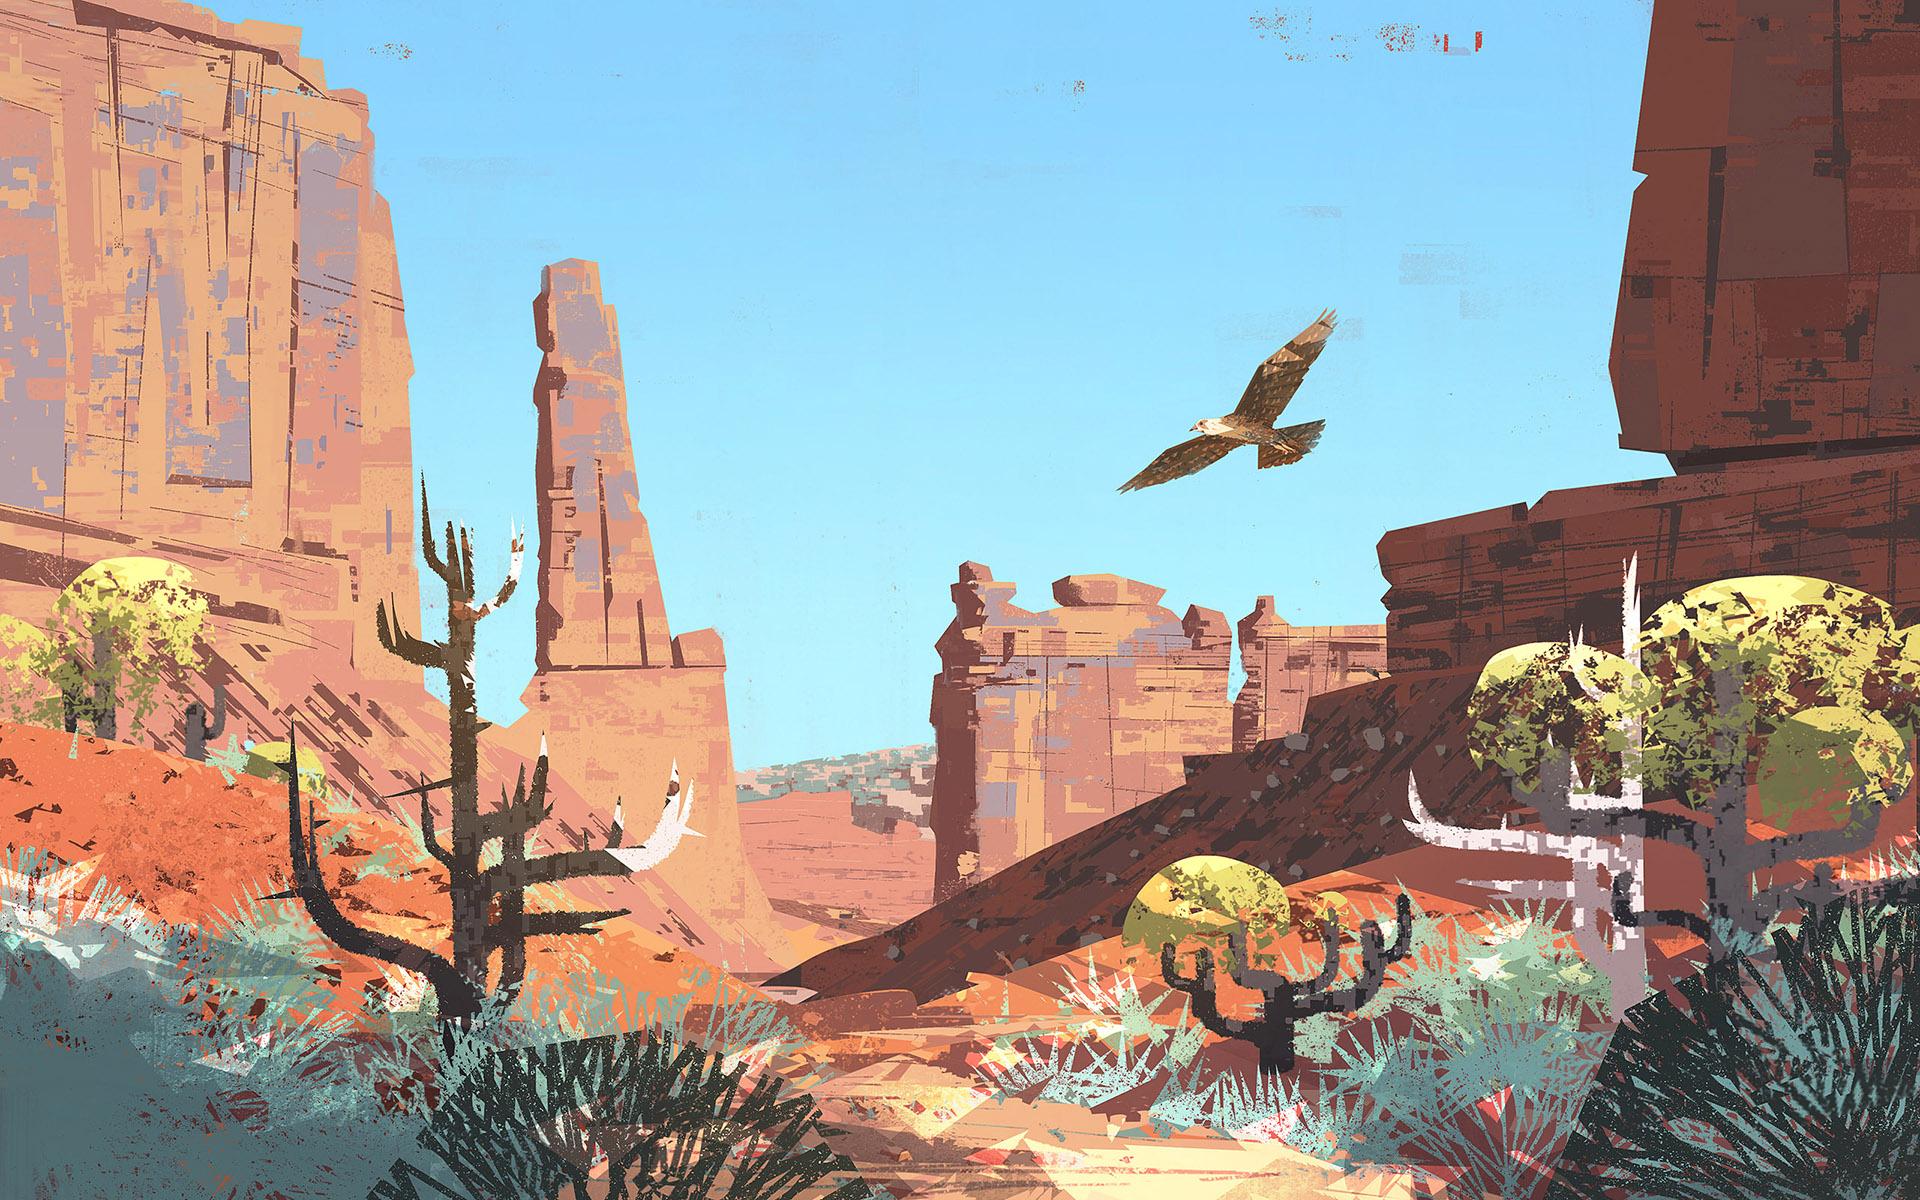 Mike McCain A站的17段精品概念插画绘画教程视频